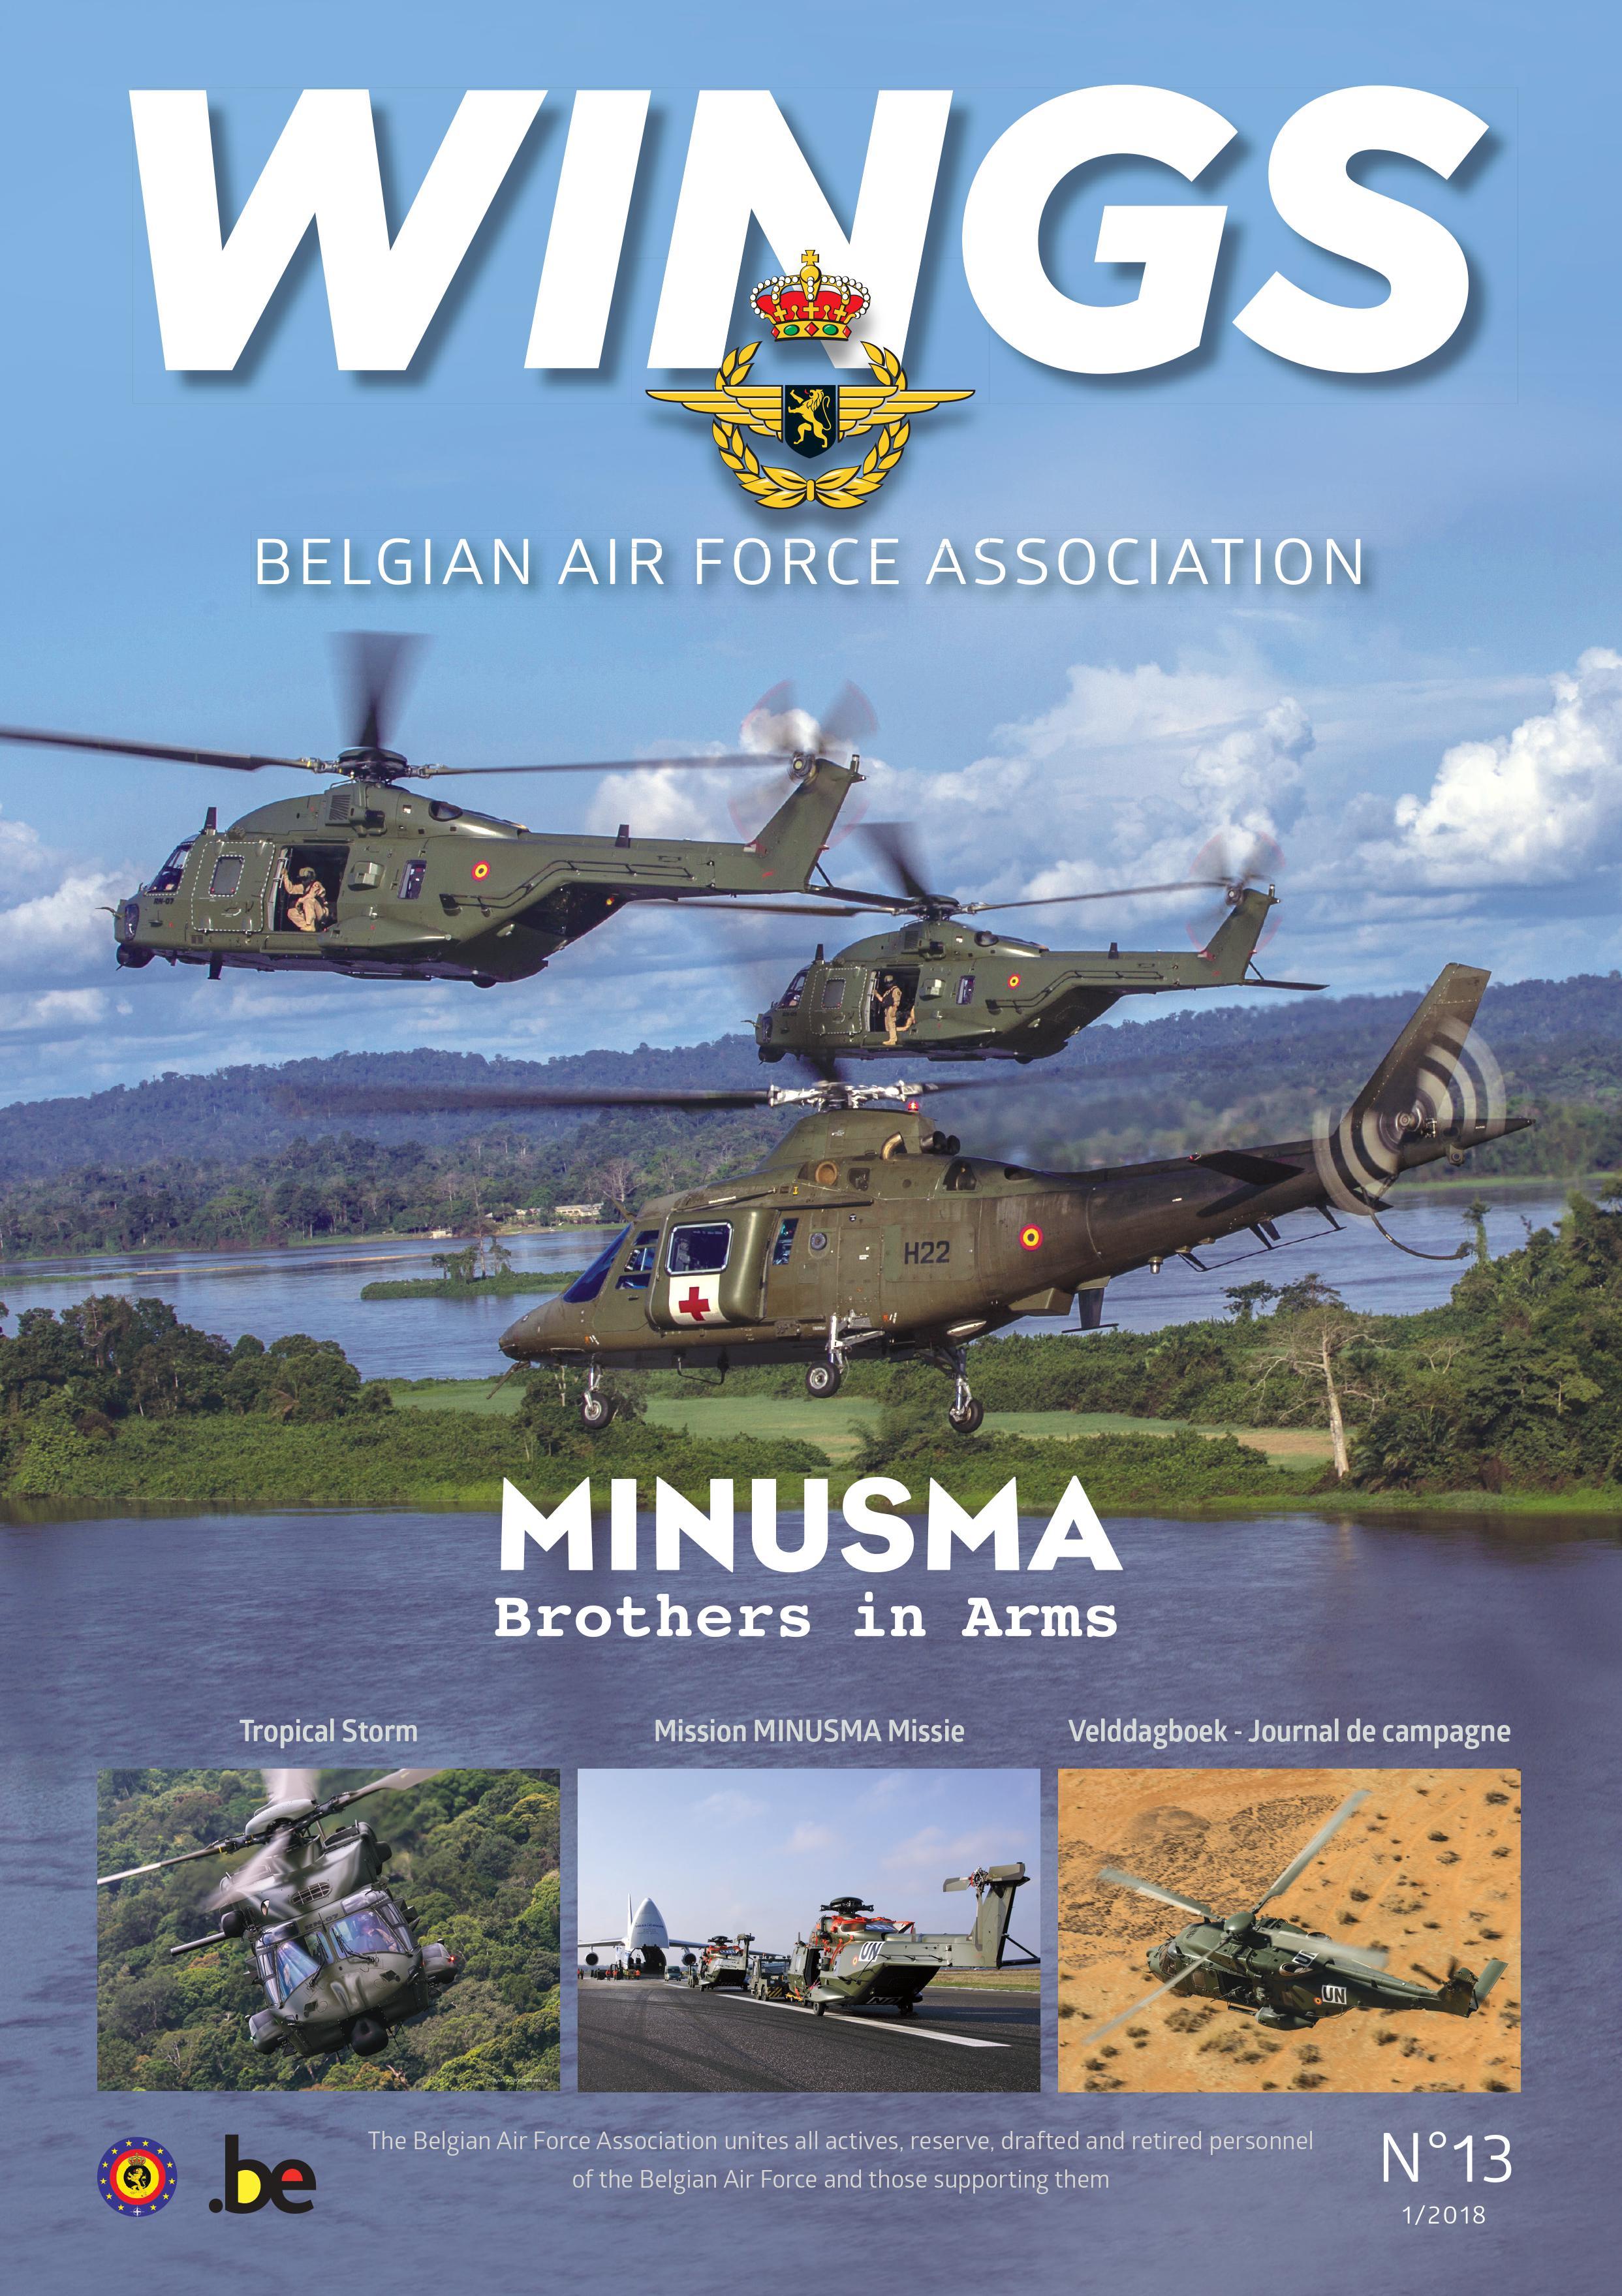 Wings 13 - Belgian Air Force Association